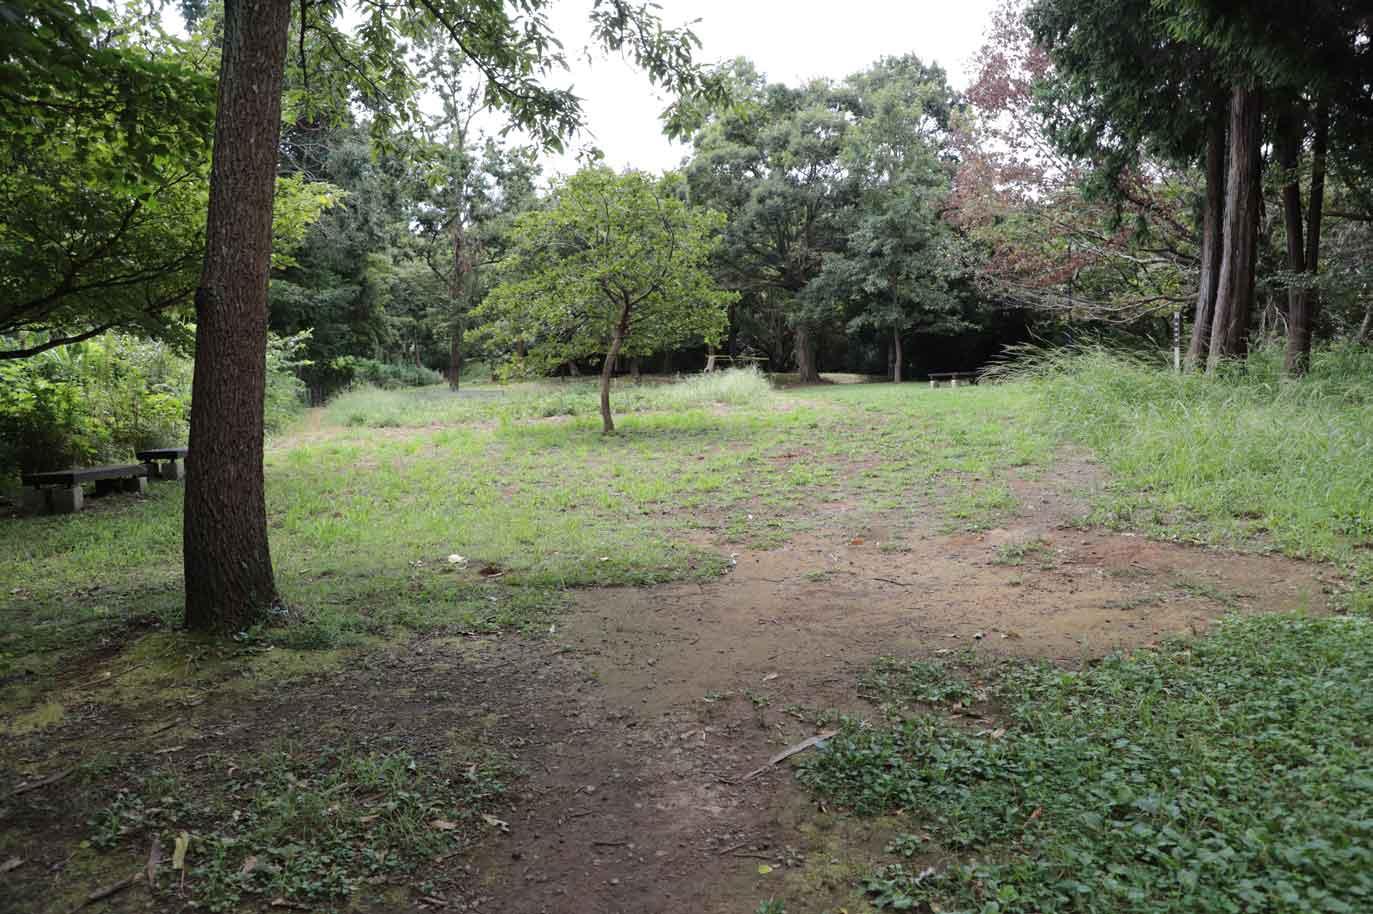 鎌倉中央公園の広場